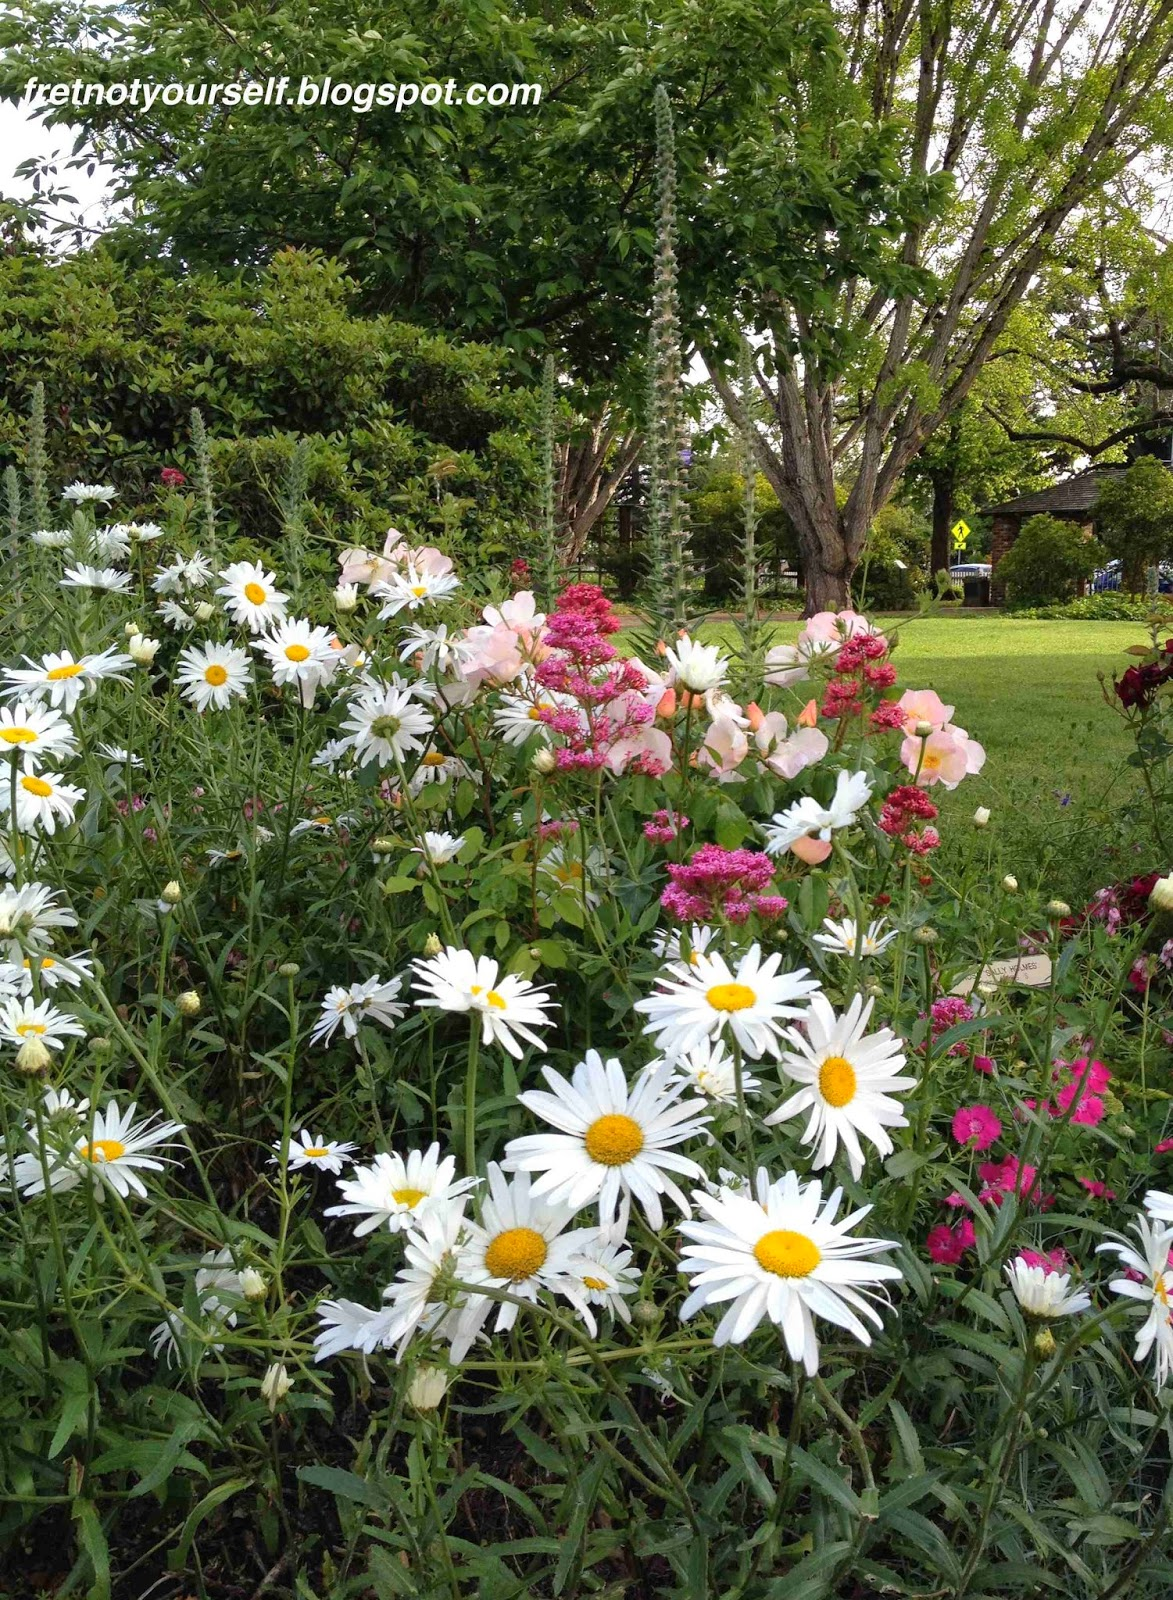 Shasta daisies, Luther Burbank gardens, Santa Rosa CA.